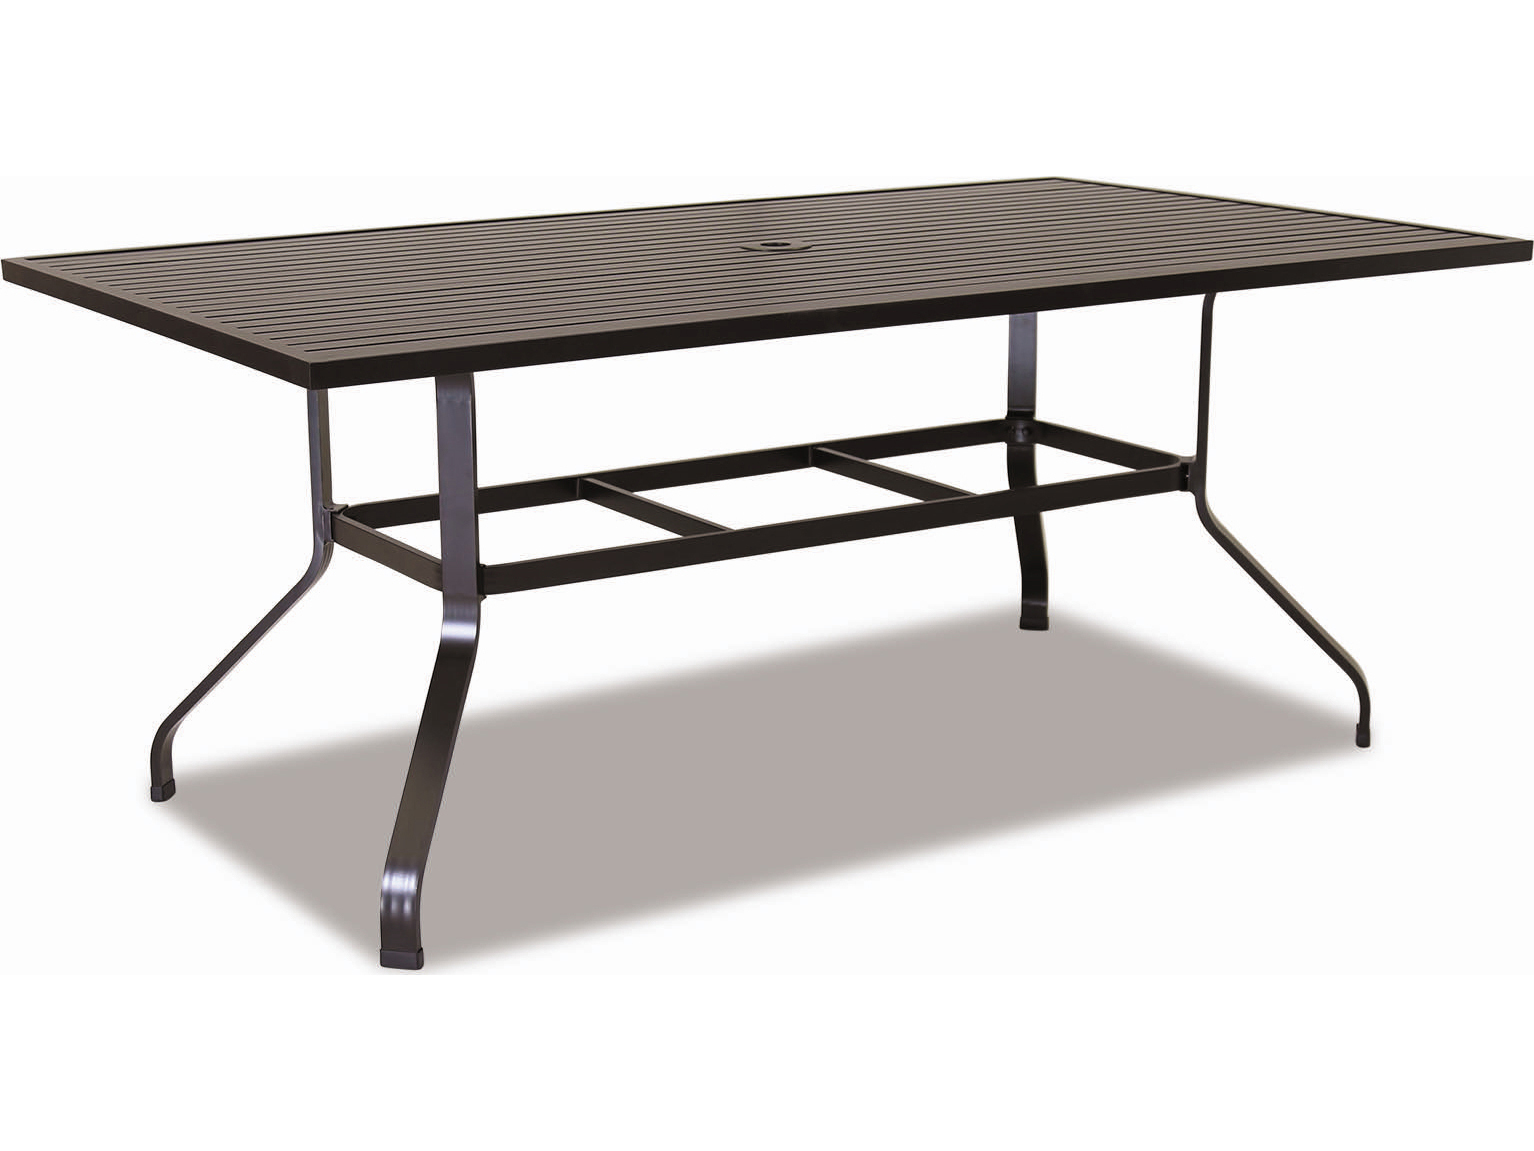 sunset west quick ship la jolla aluminum 72 x 48 rectangular dining table 401 t72. Black Bedroom Furniture Sets. Home Design Ideas